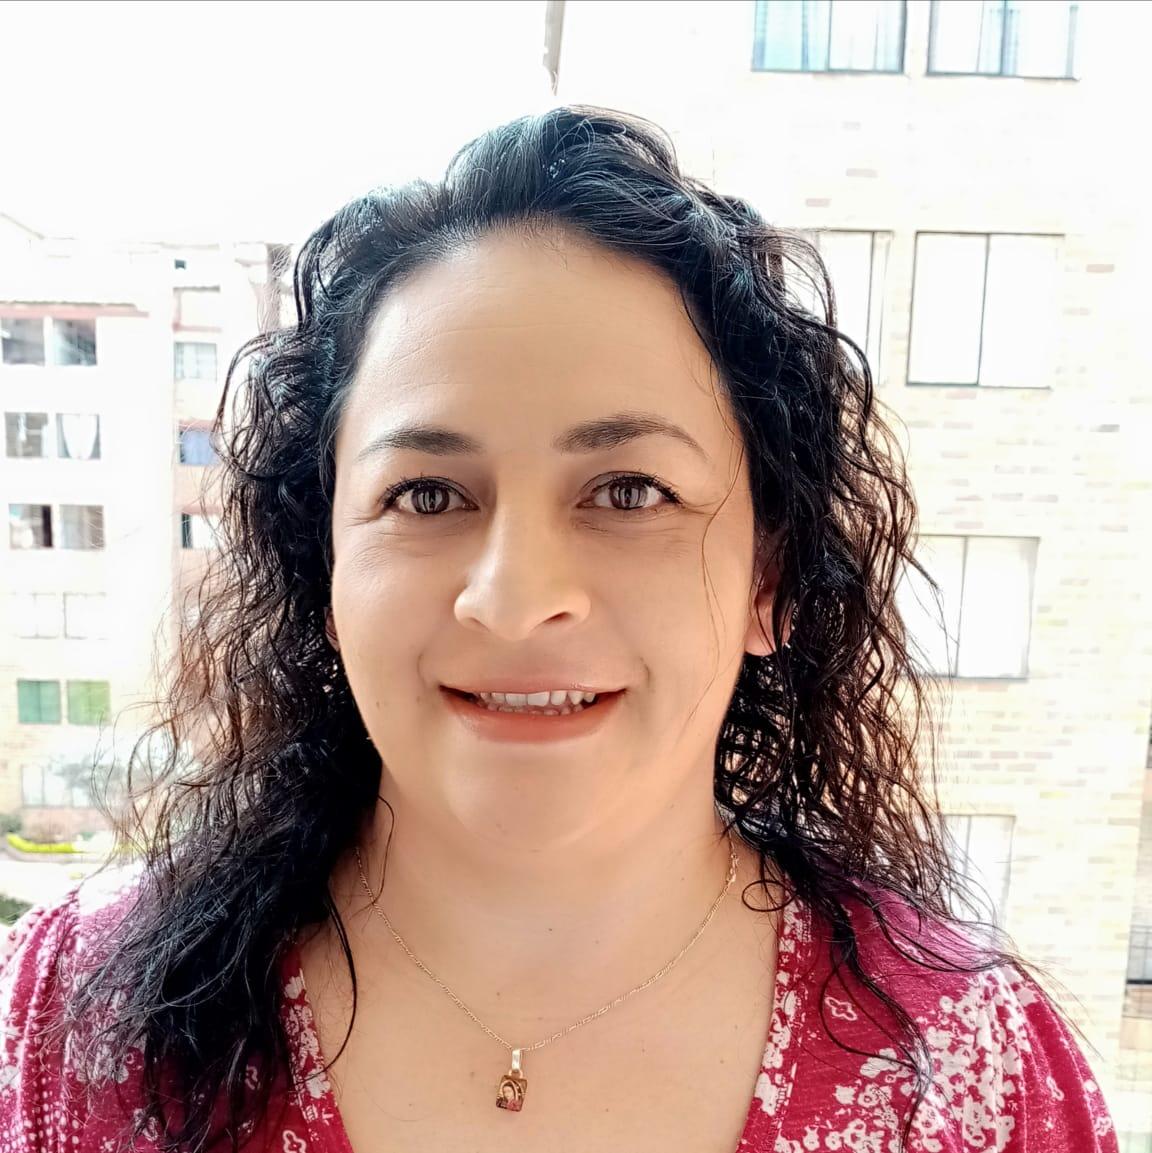 Avatar creador Monica Johanna  Sandoval Rincon Sandoval Rincon